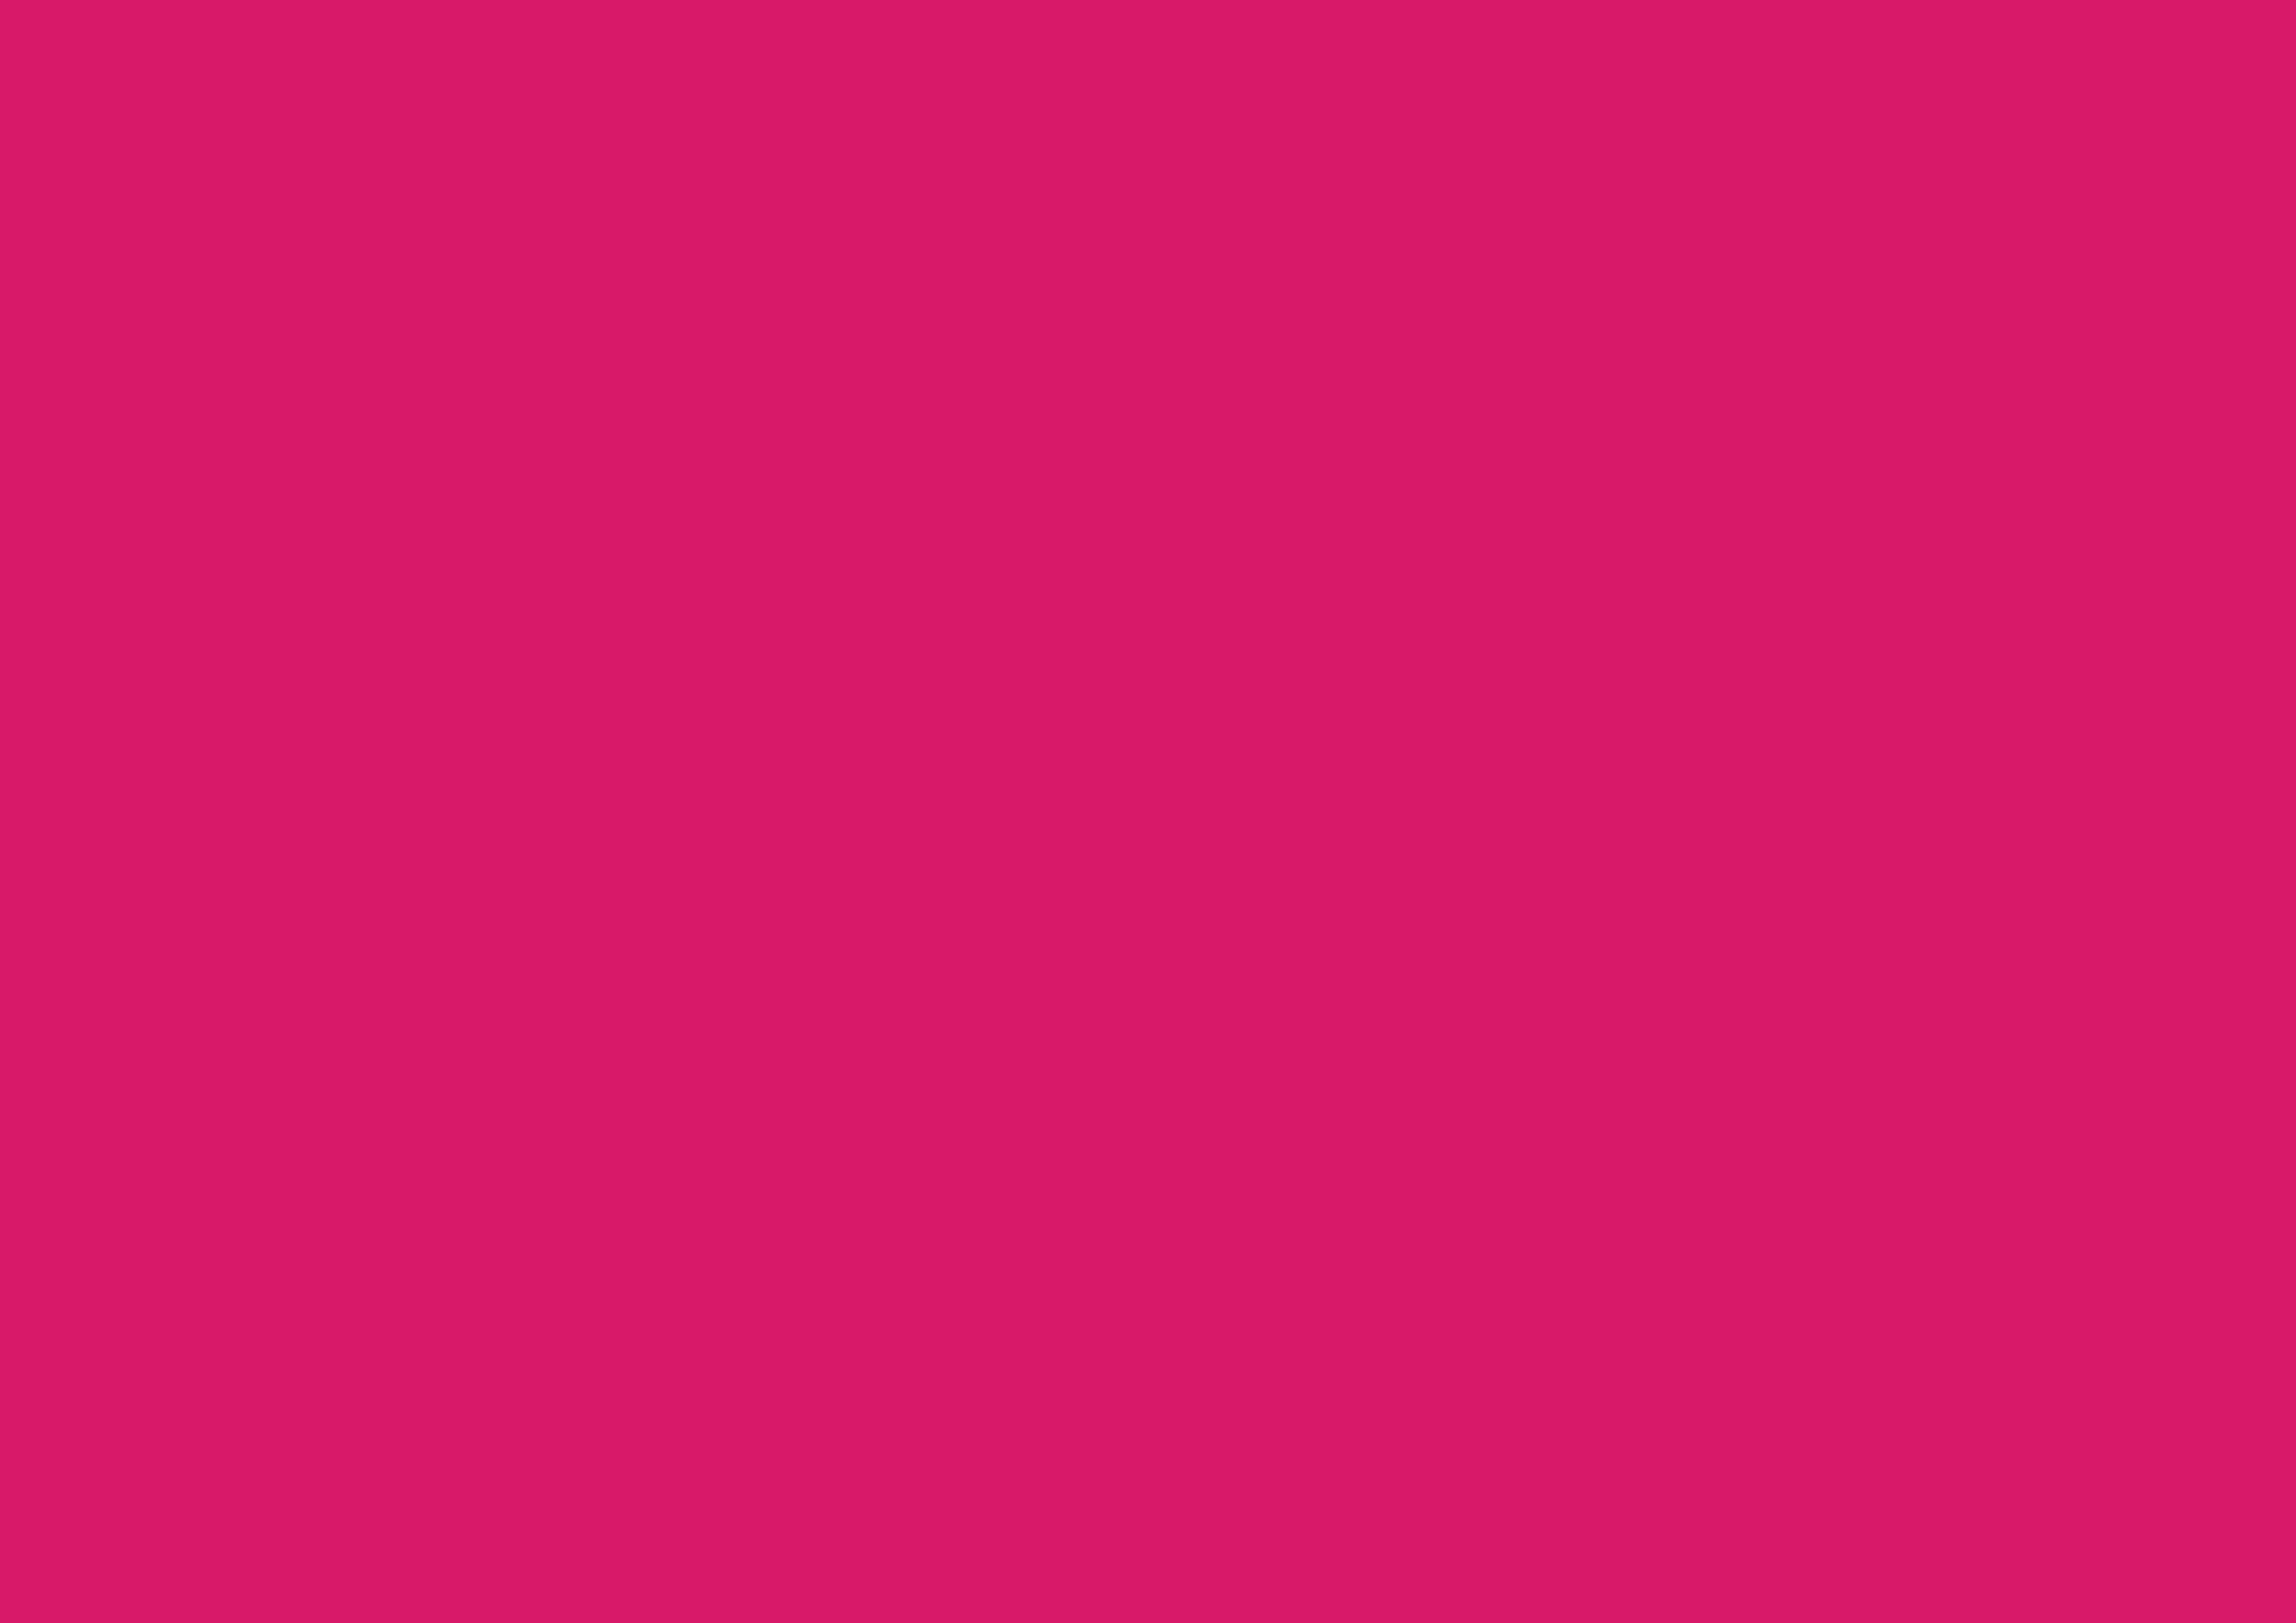 3508x2480 Dogwood Rose Solid Color Background